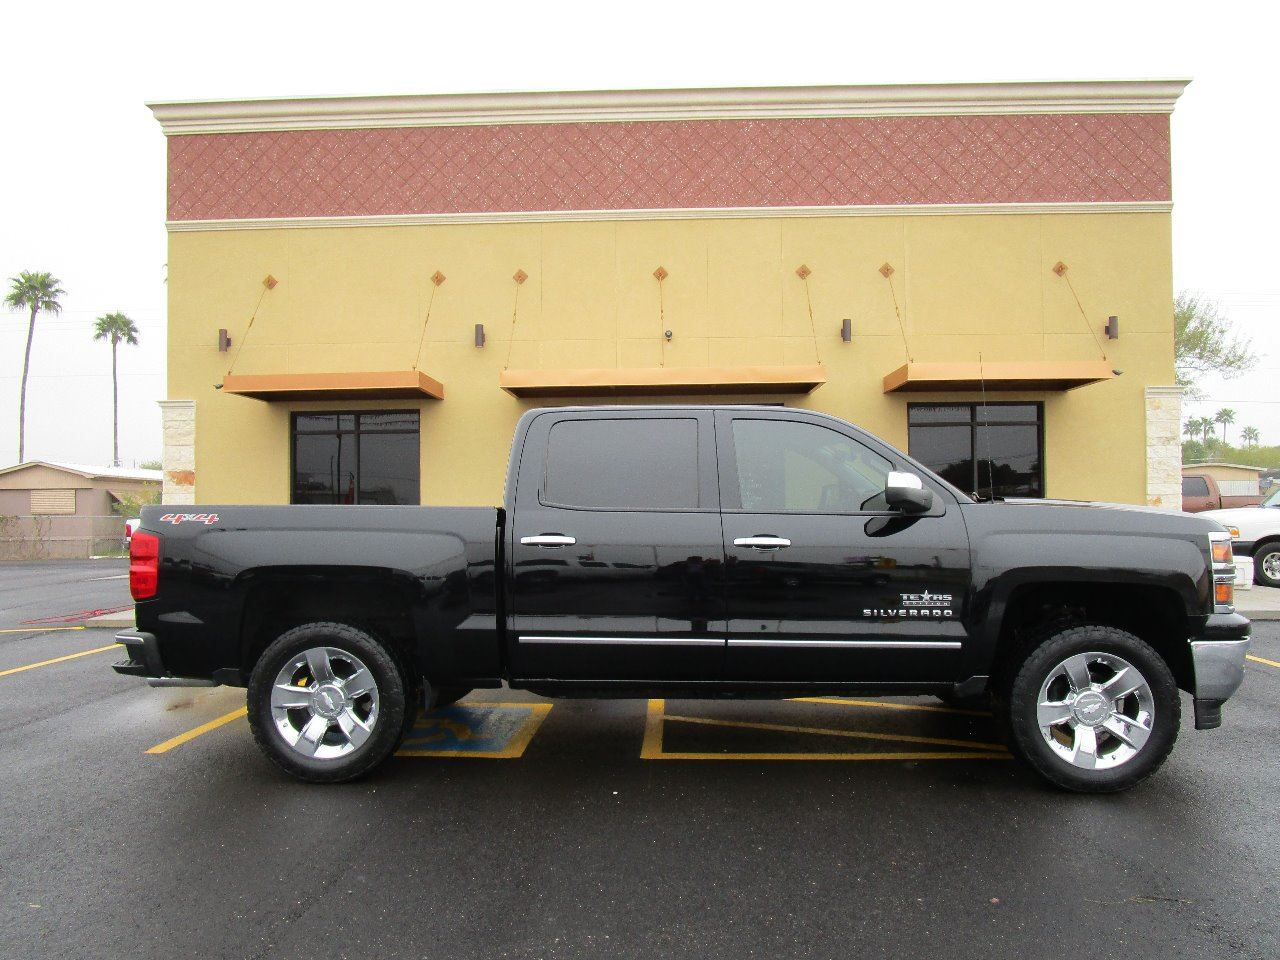 Mission Auto & Truck Sales, Inc.